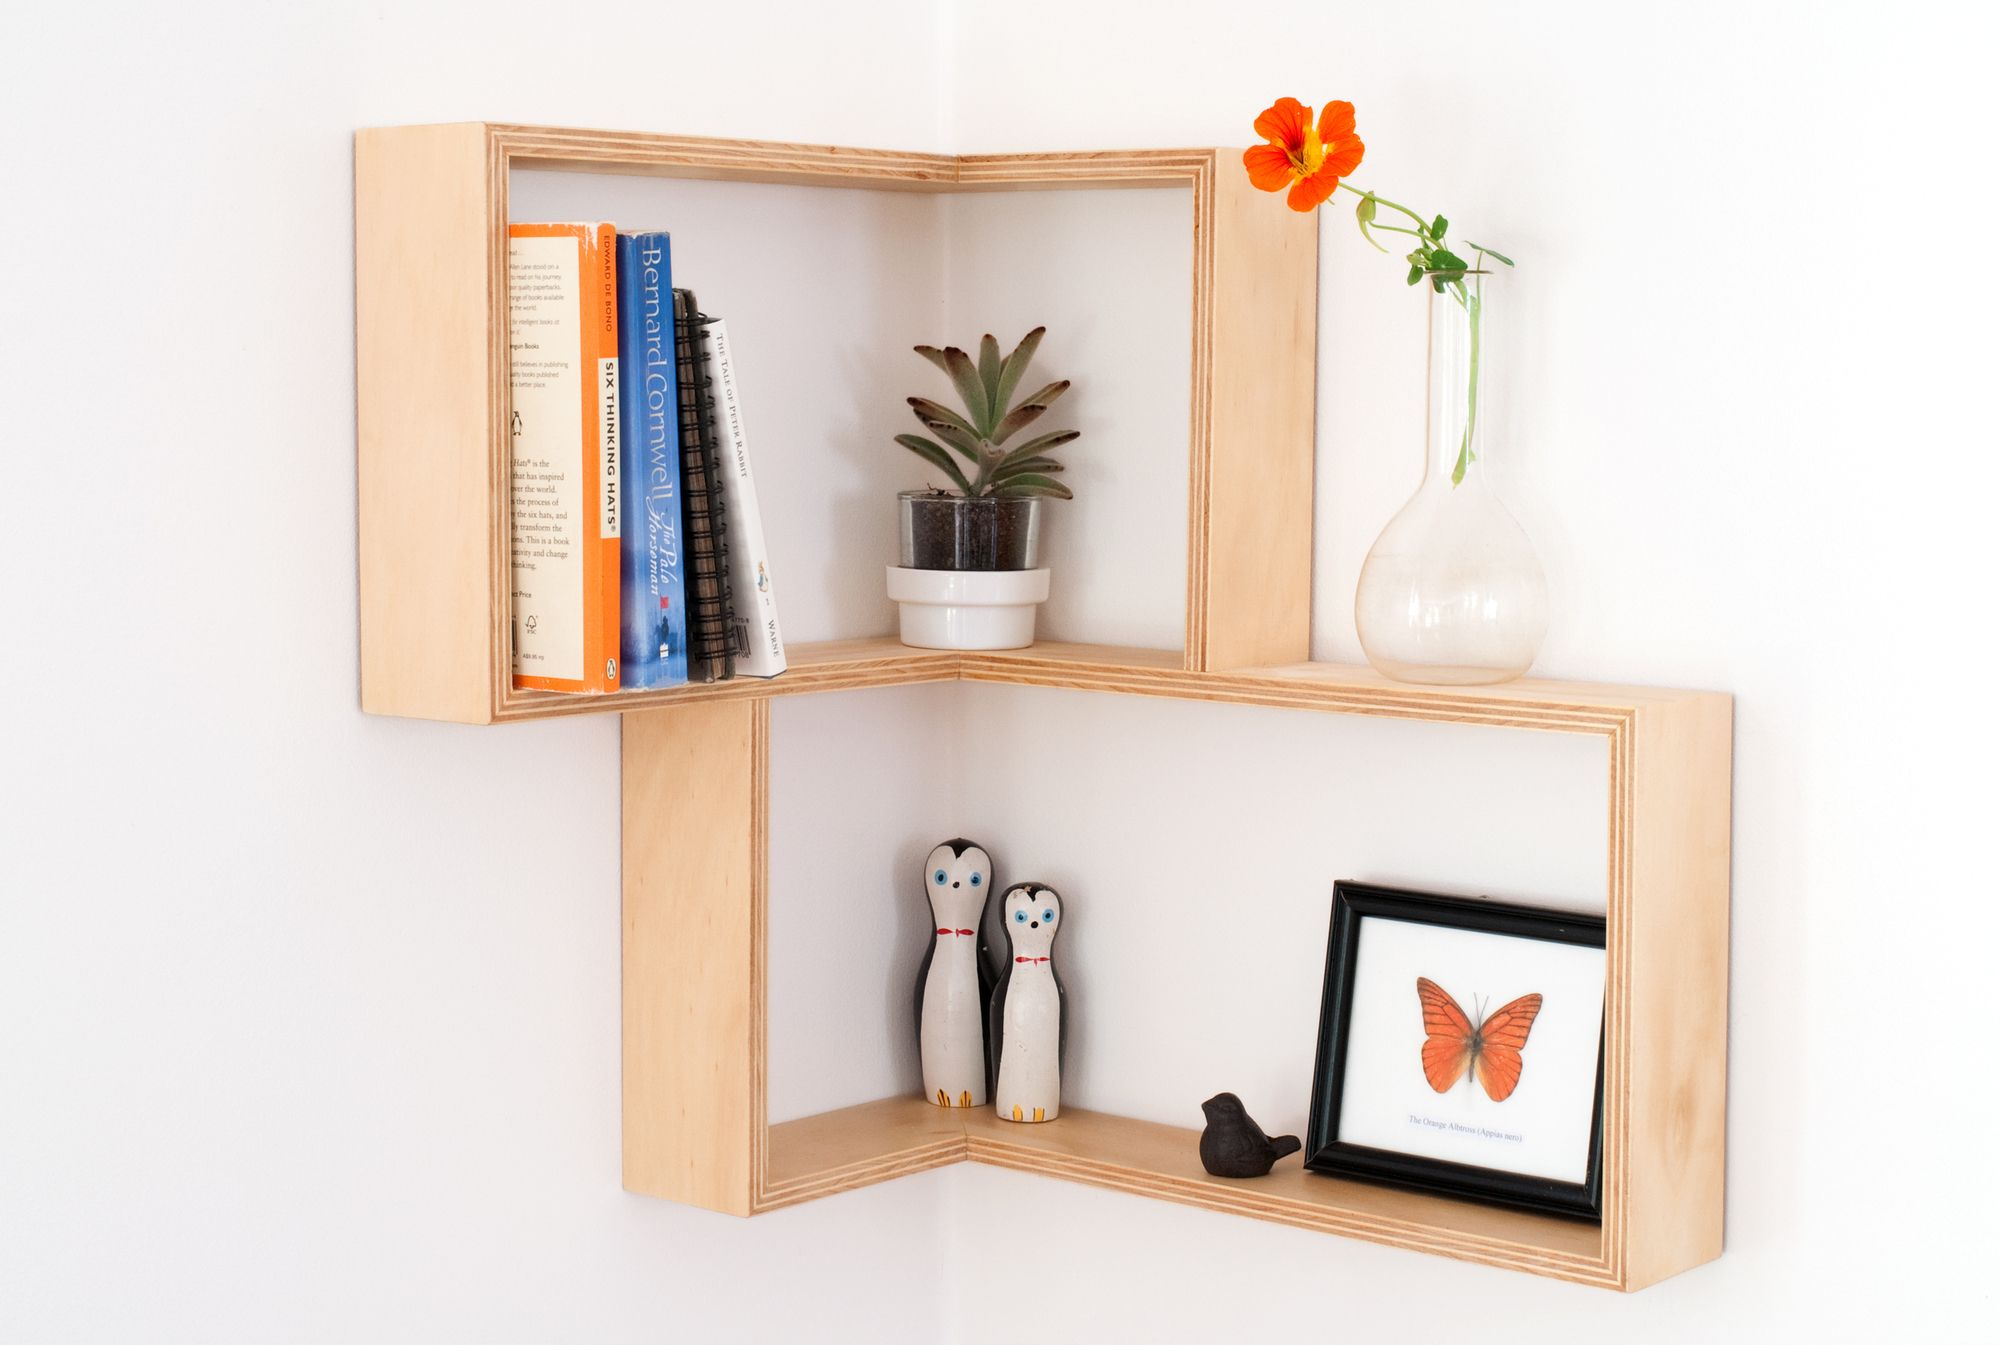 Delightful Corner Shelf: Display Cabinet Book Shelves Shadow Box Retro Vintage  Mid Century In Home U0026 Garden, Furniture, Bookshelves